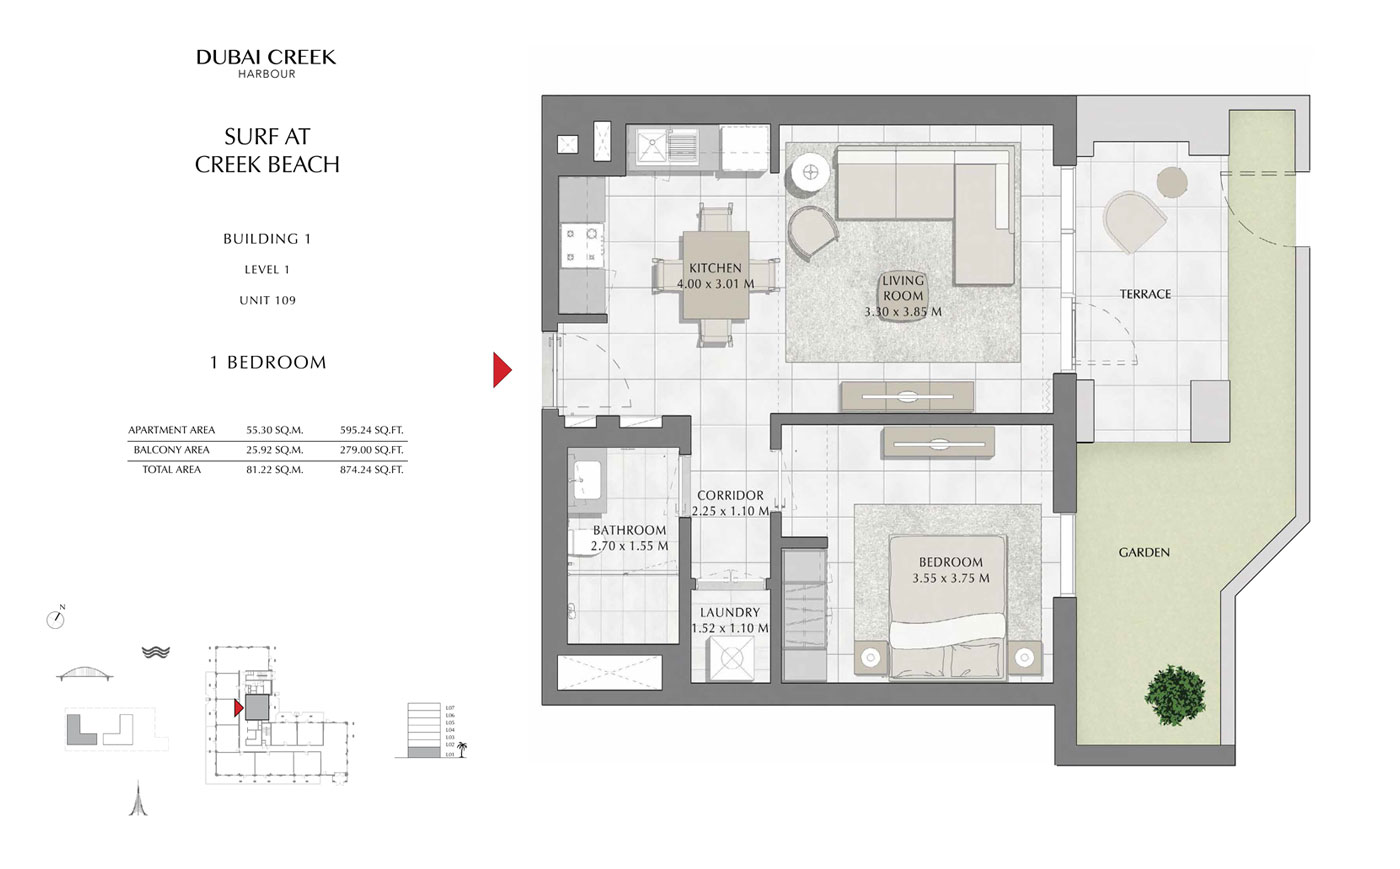 Building-1-1-Bedroom,-Level-1,-Unit-109,-Size-874.24-sq-ft